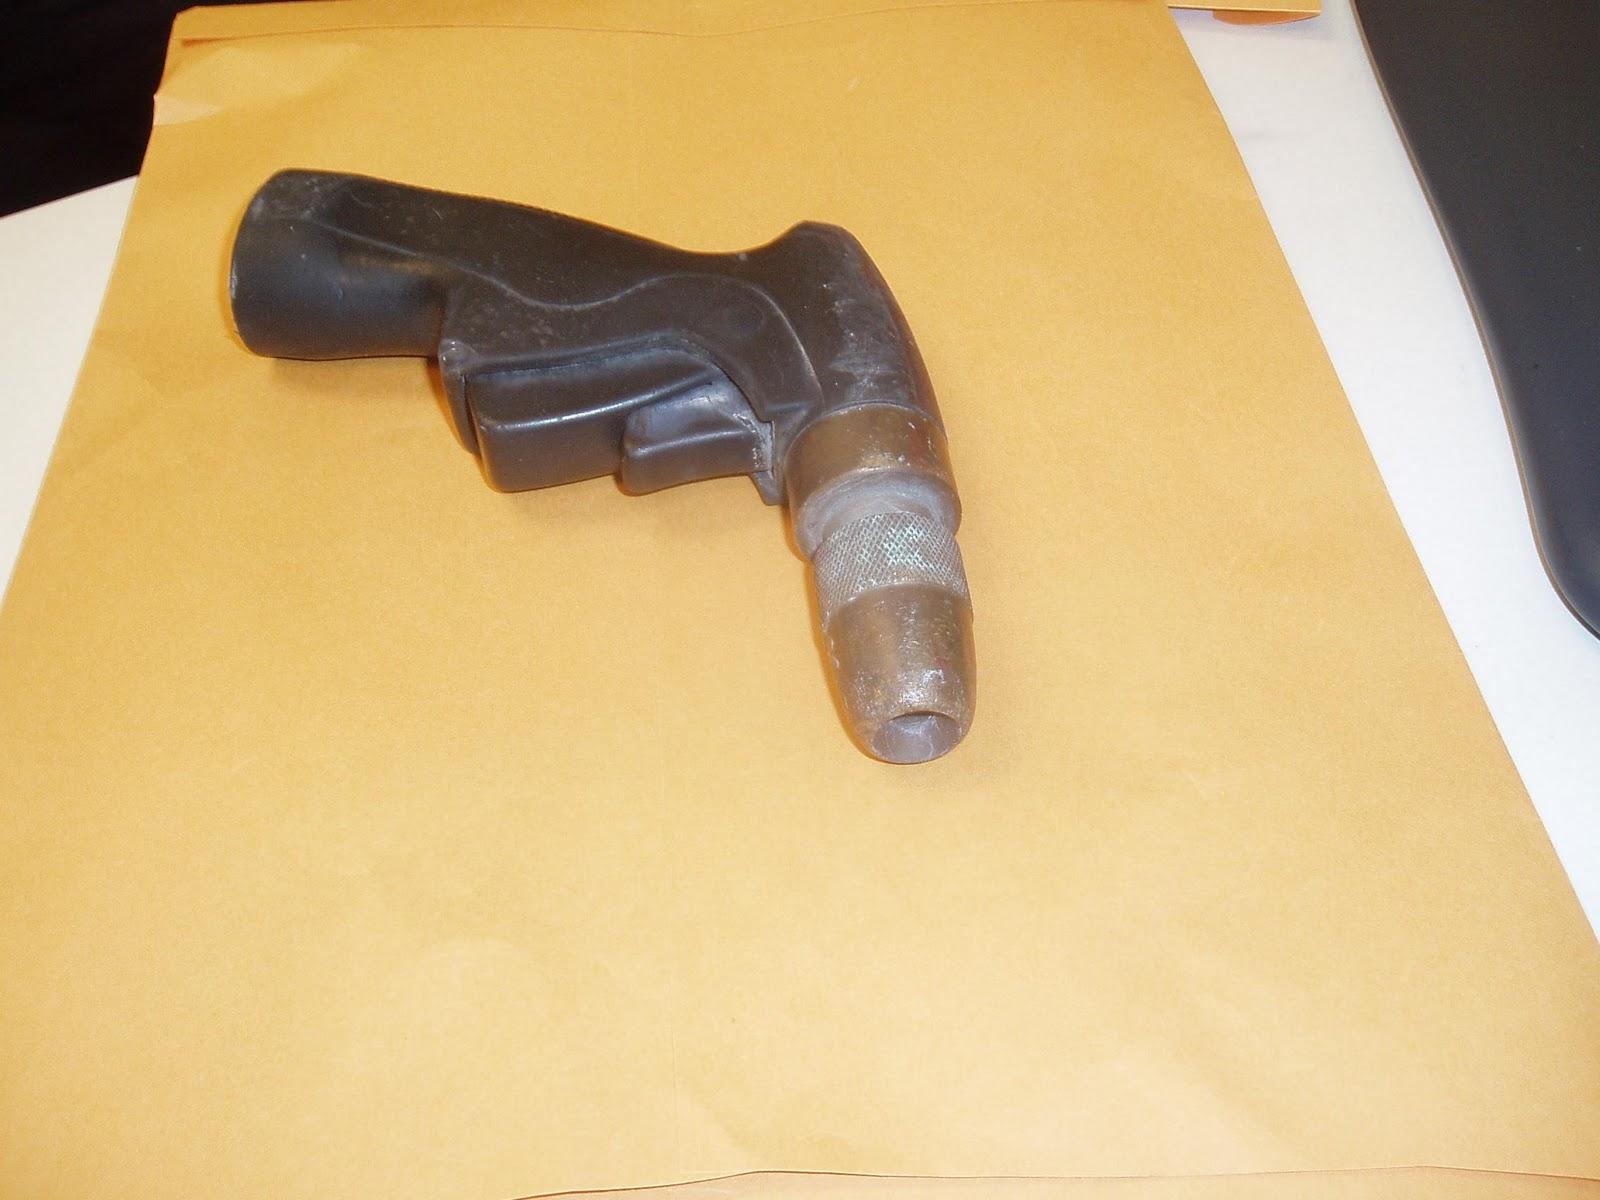 Long Beach Police Shooting Hose Nozzle